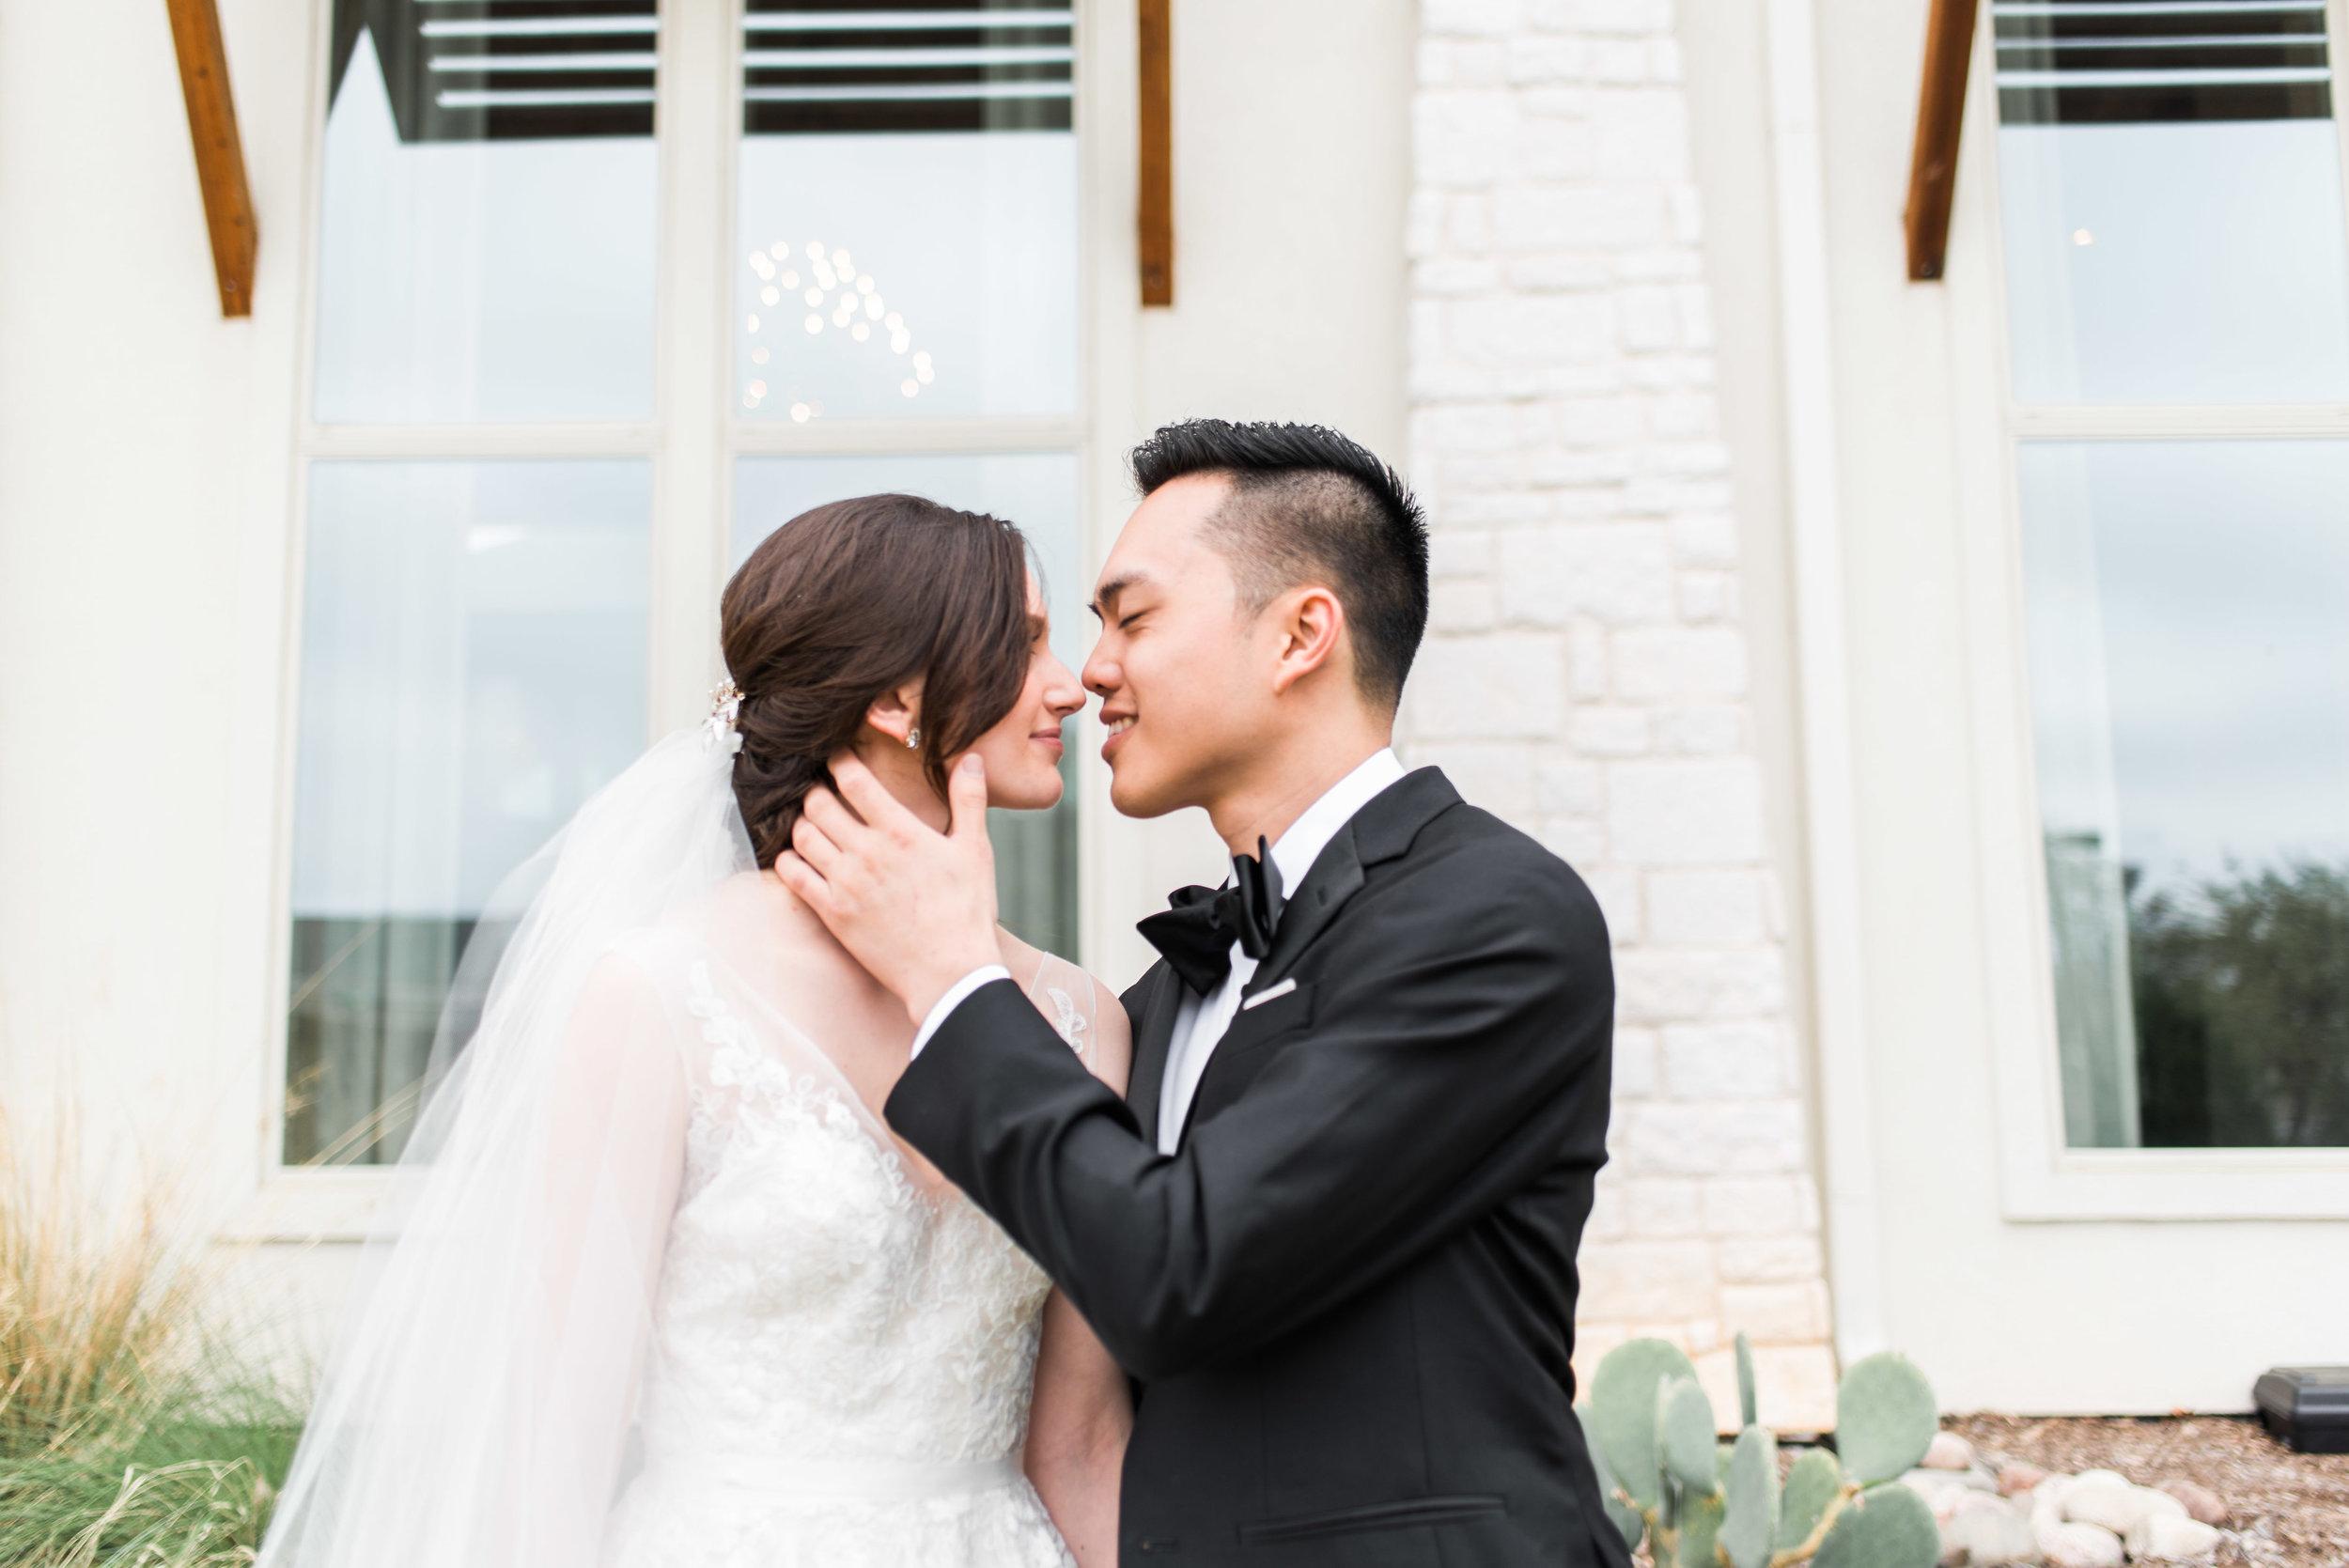 gray-door-photography-wedding-photographer-steph-erffmeyer-dallas-destination10.jpg